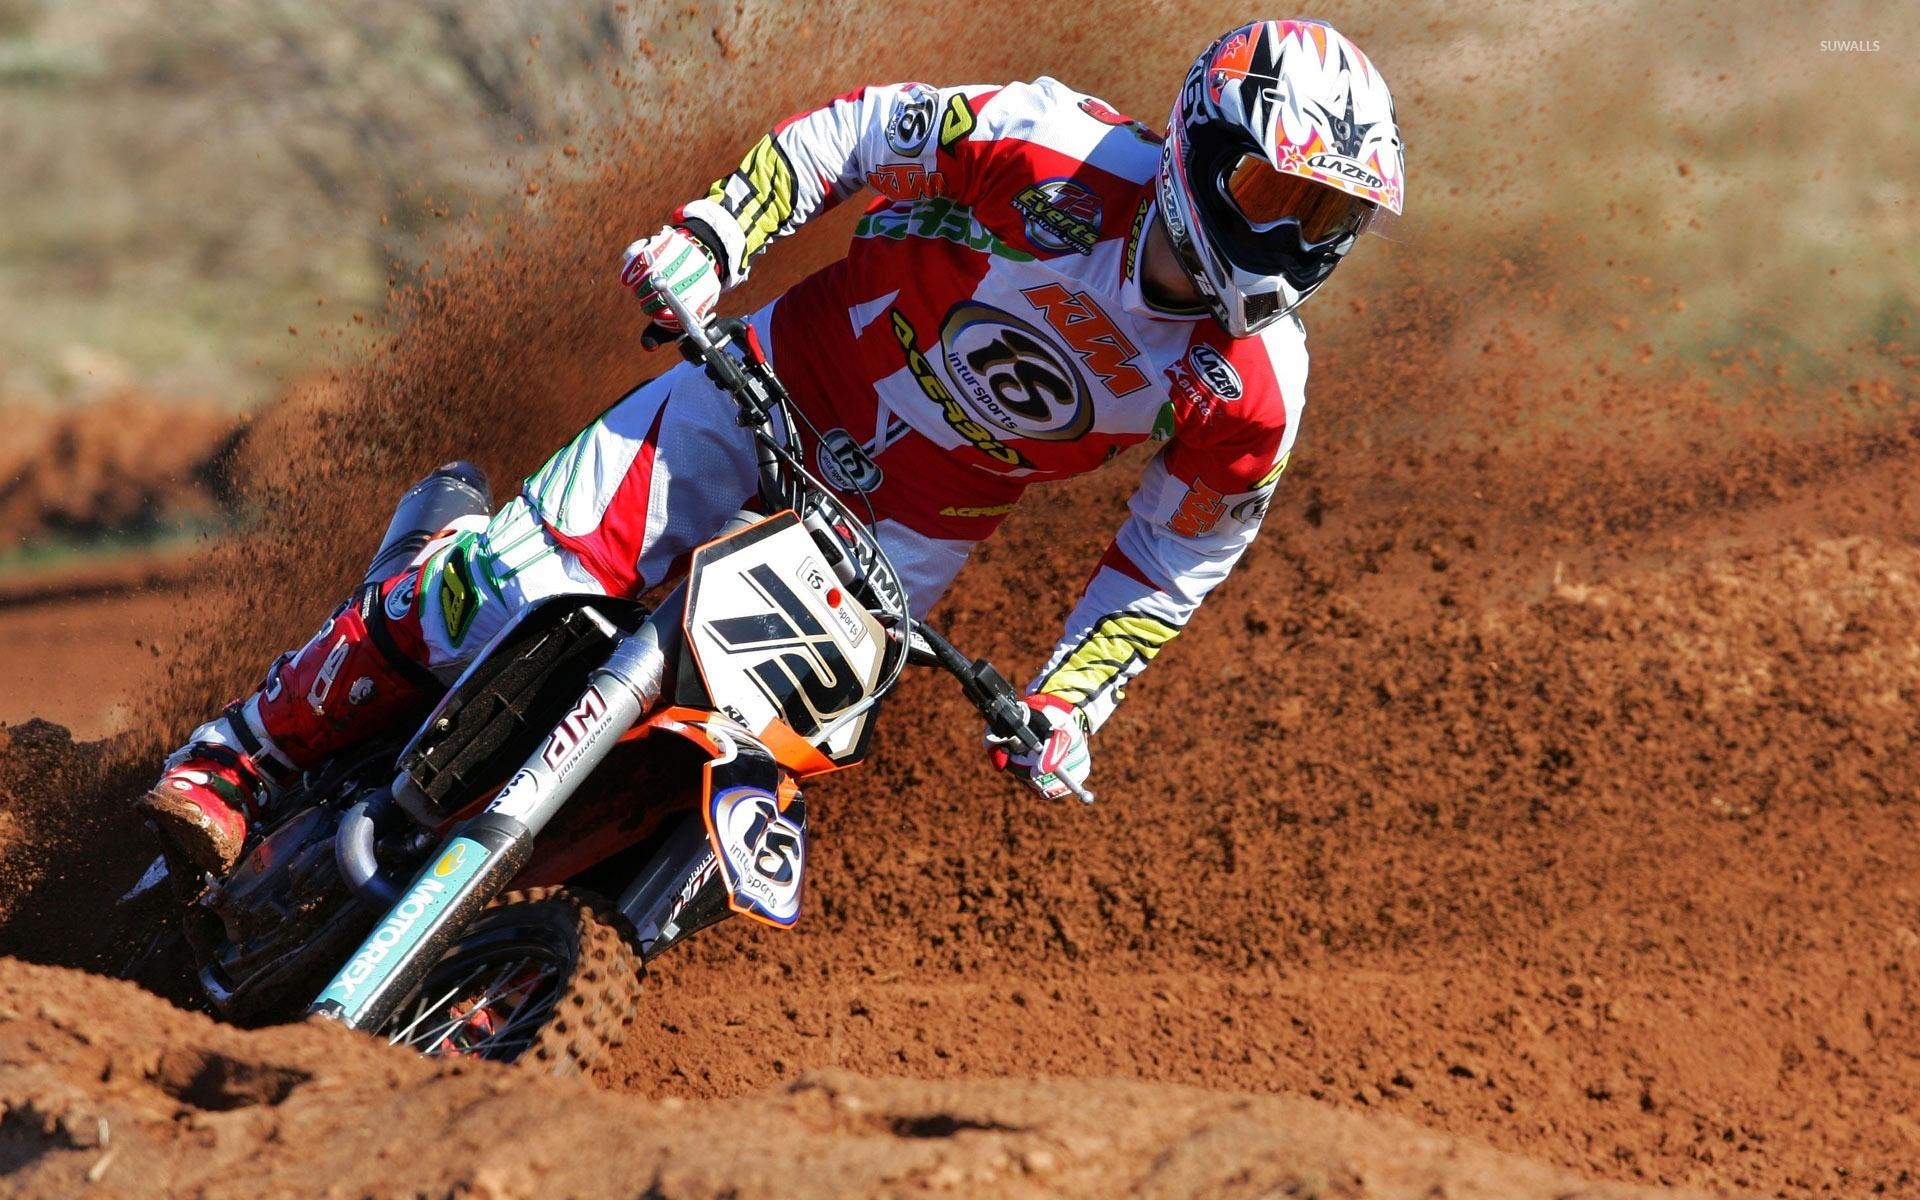 KTM motocross wallpaper   Motorcycle wallpapers   24126 1366x768